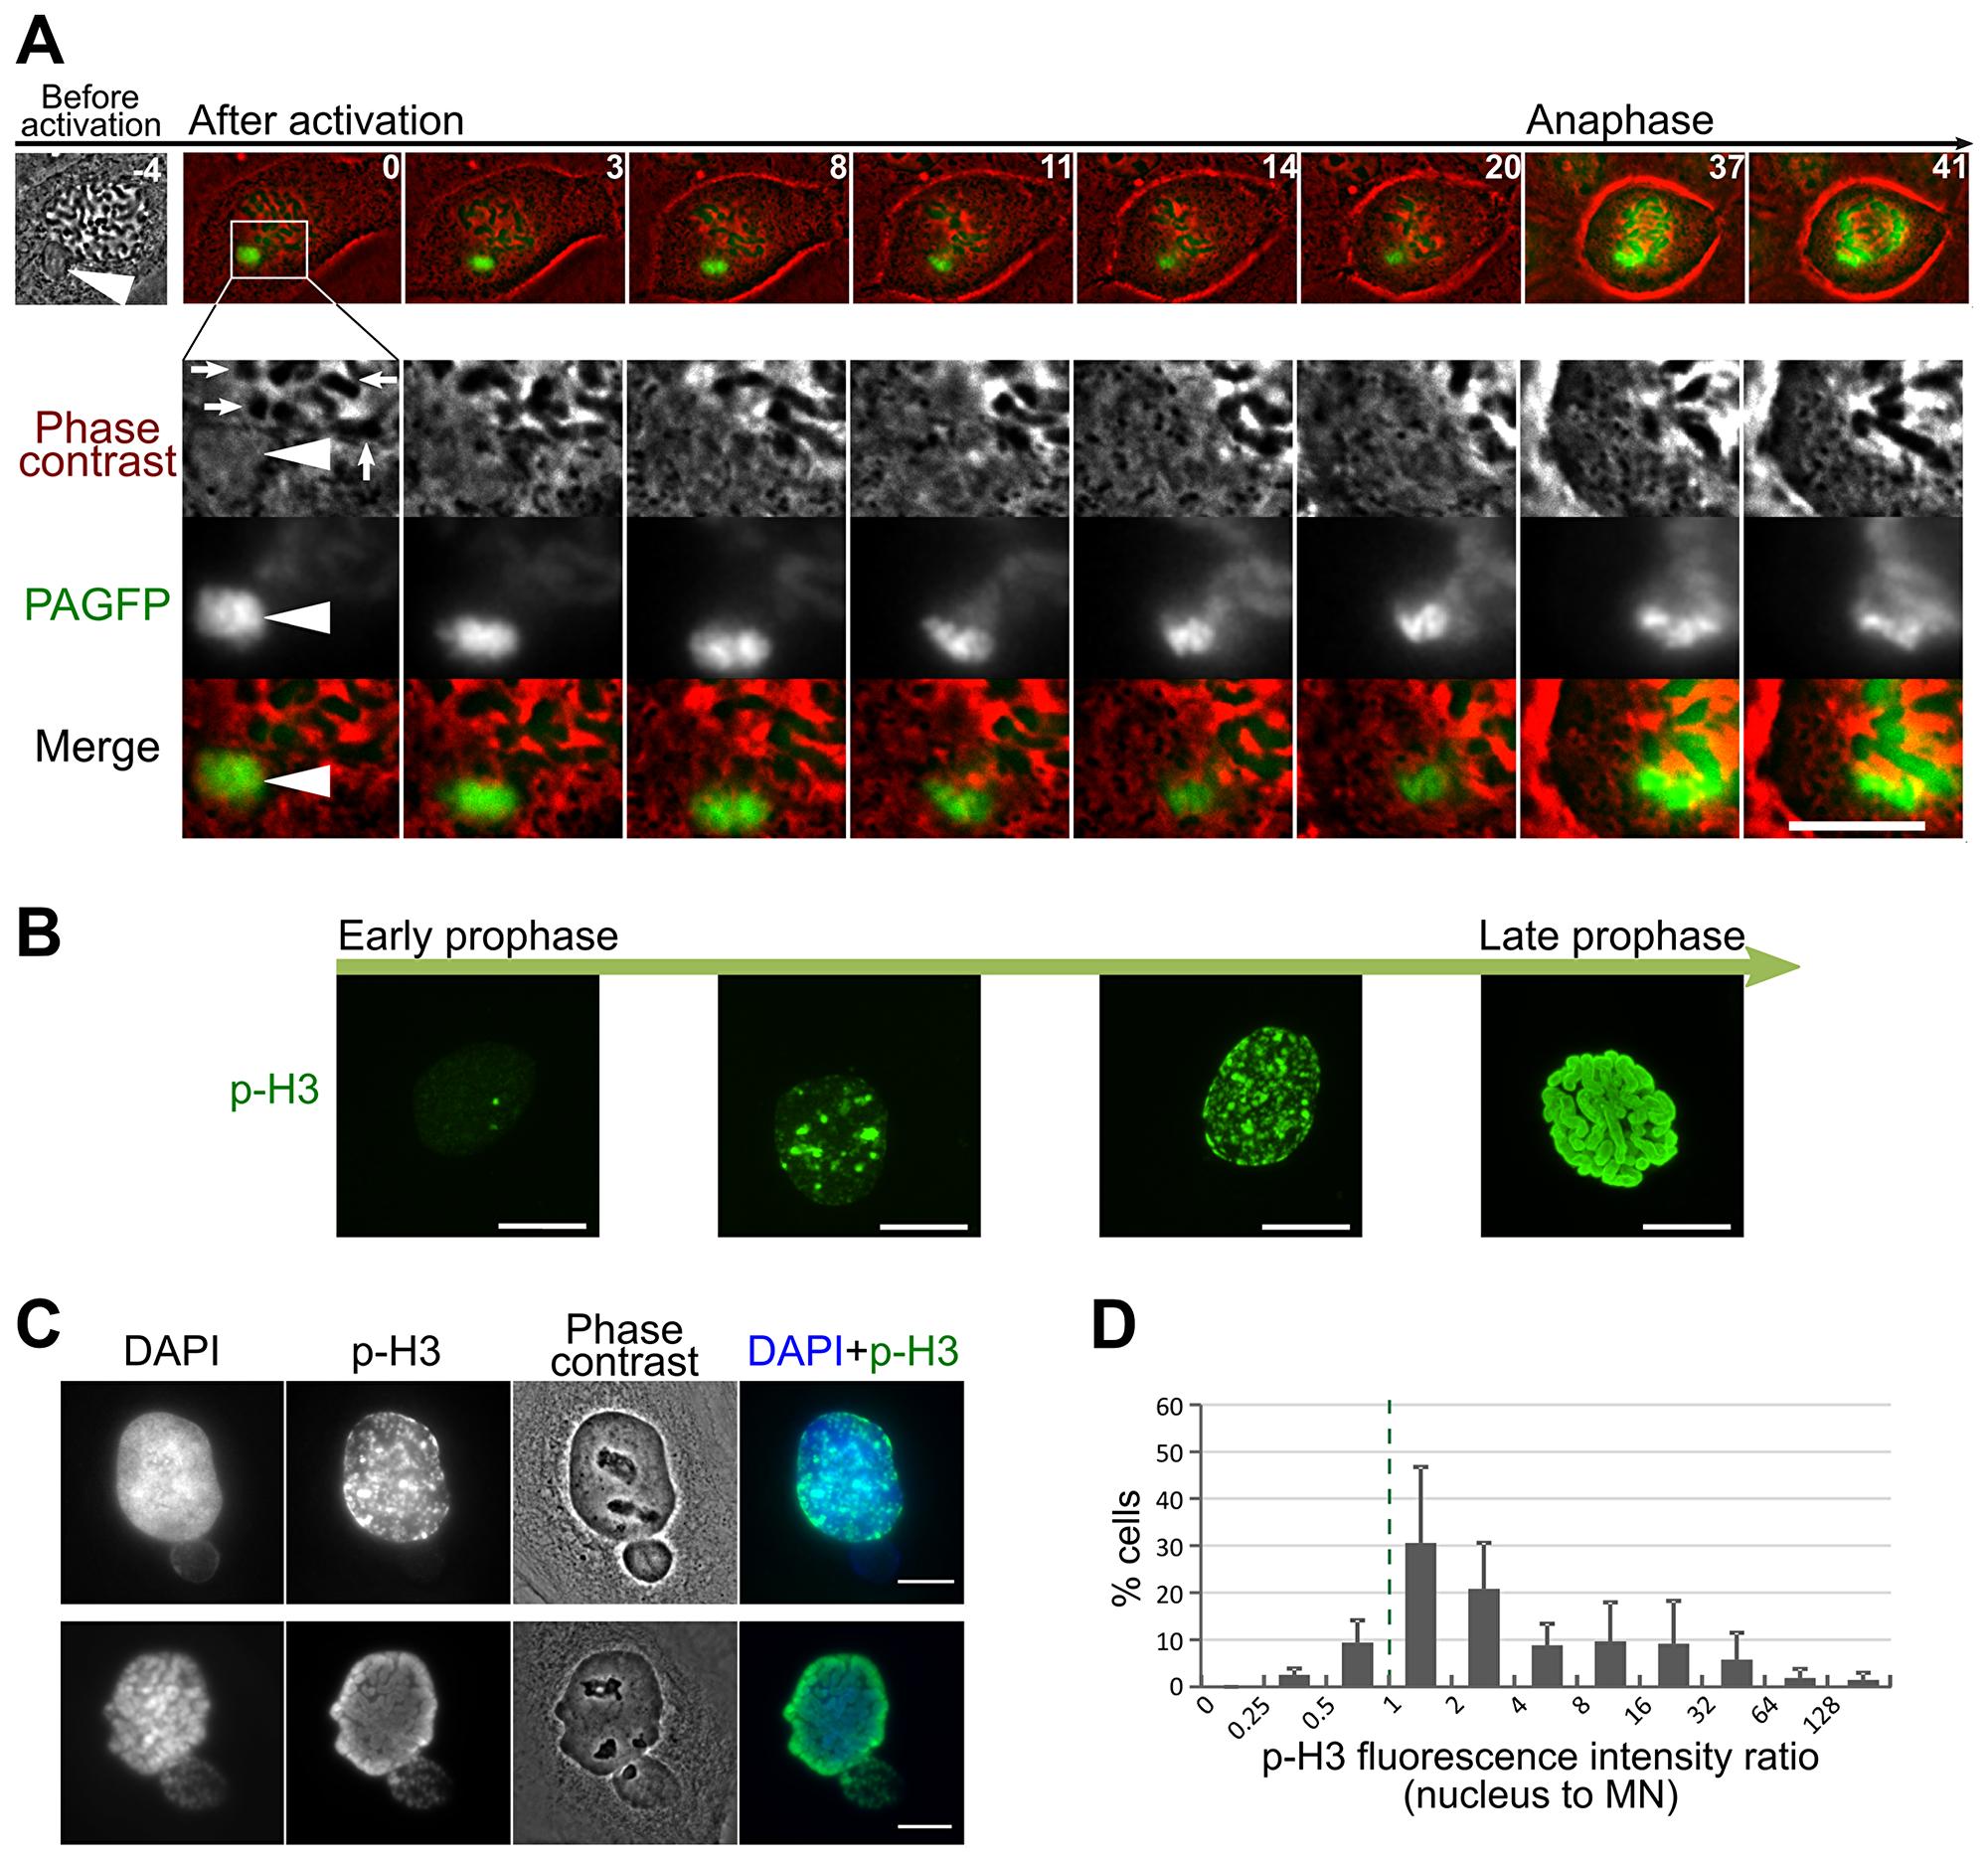 Delayed chromosome condensation of mnChrs.